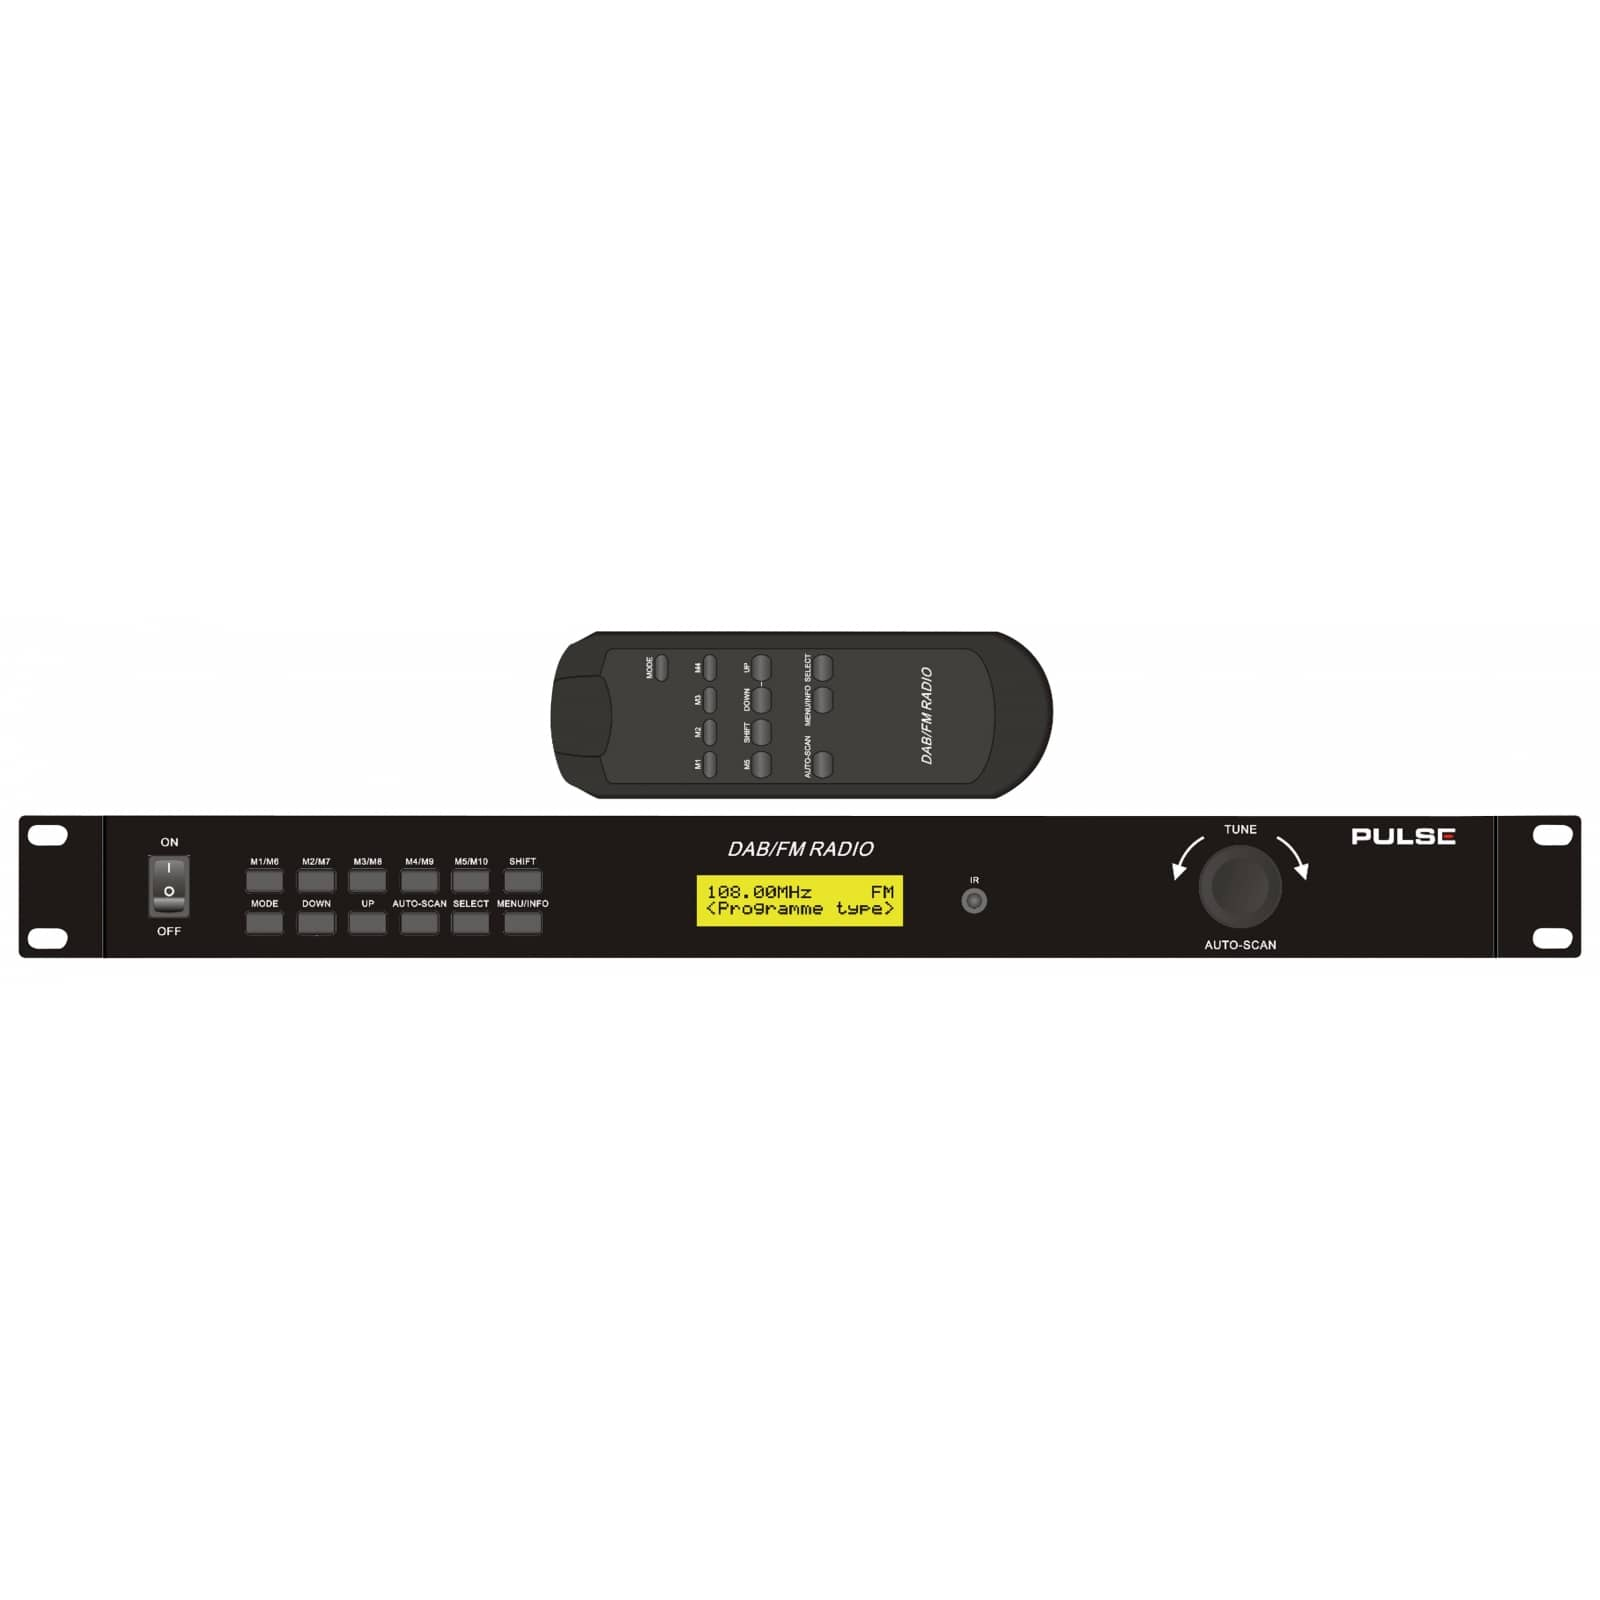 Dab / dab + radio with fm tuner bluetooth function alarm with adjustable interval